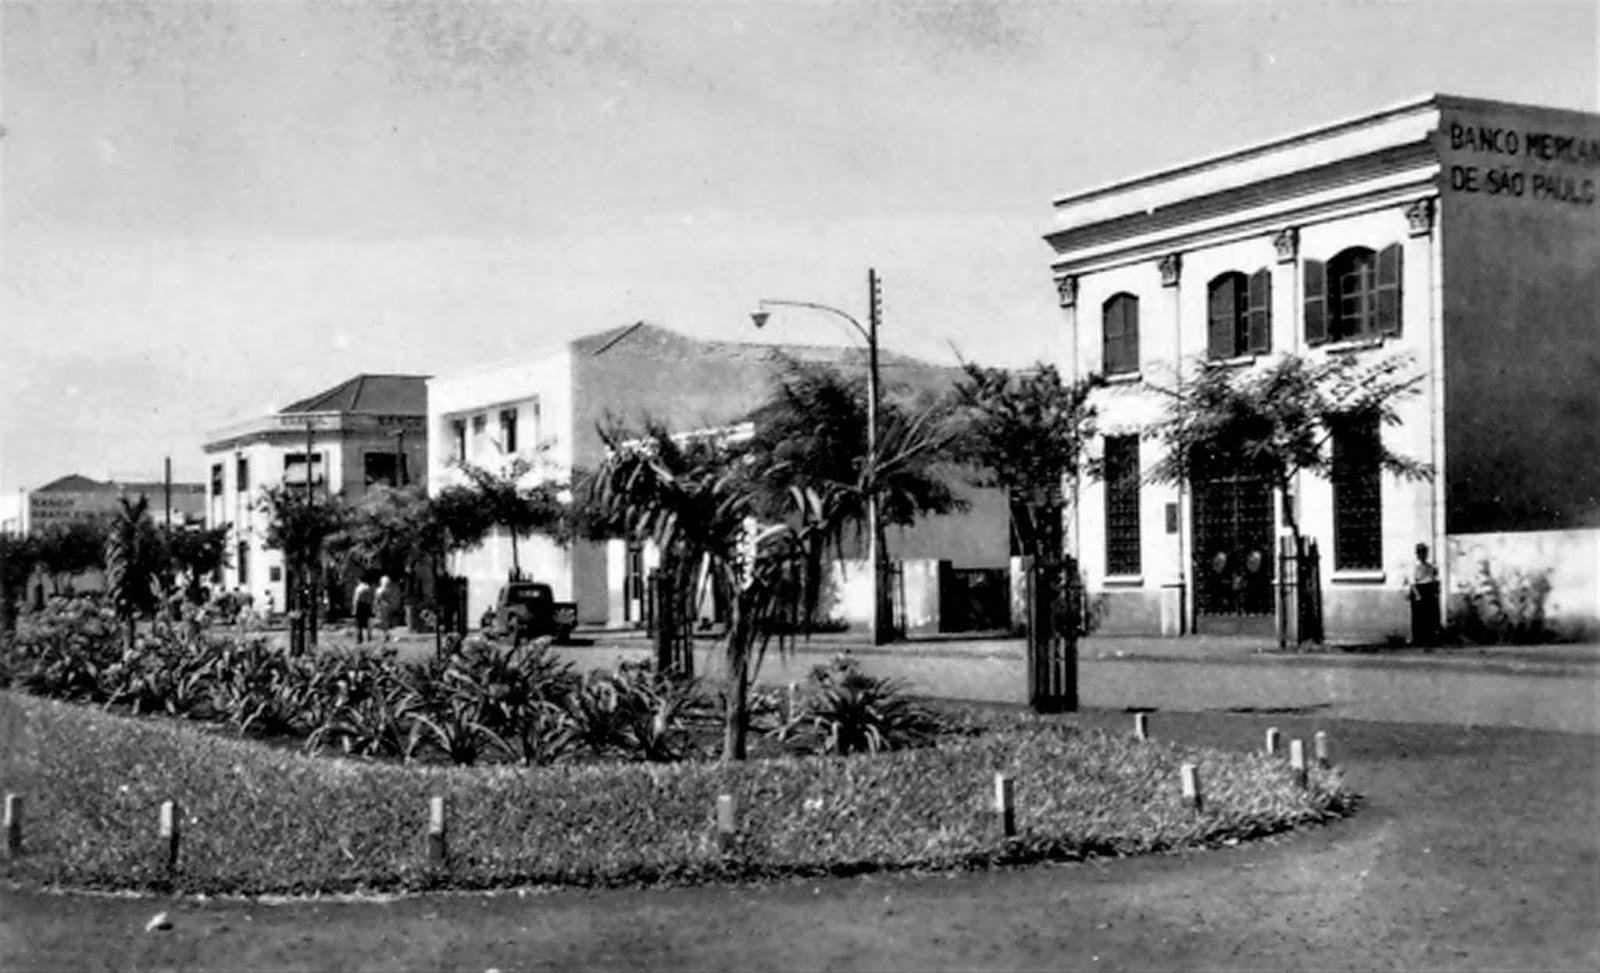 Avenida Getúlio Vargas - Década de 1950